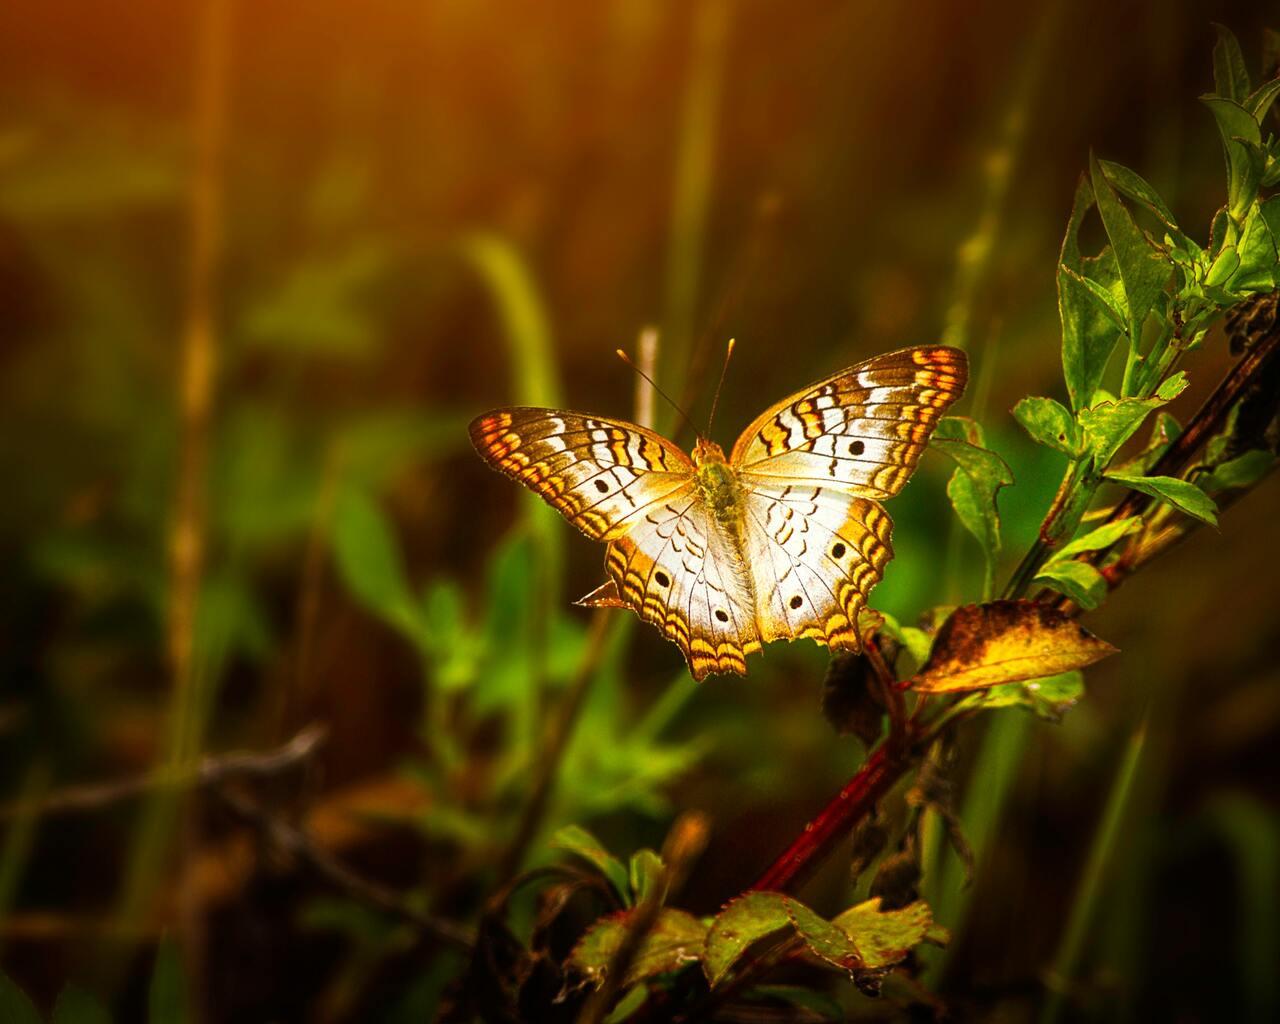 butterfly-on-leaf-sm.jpg